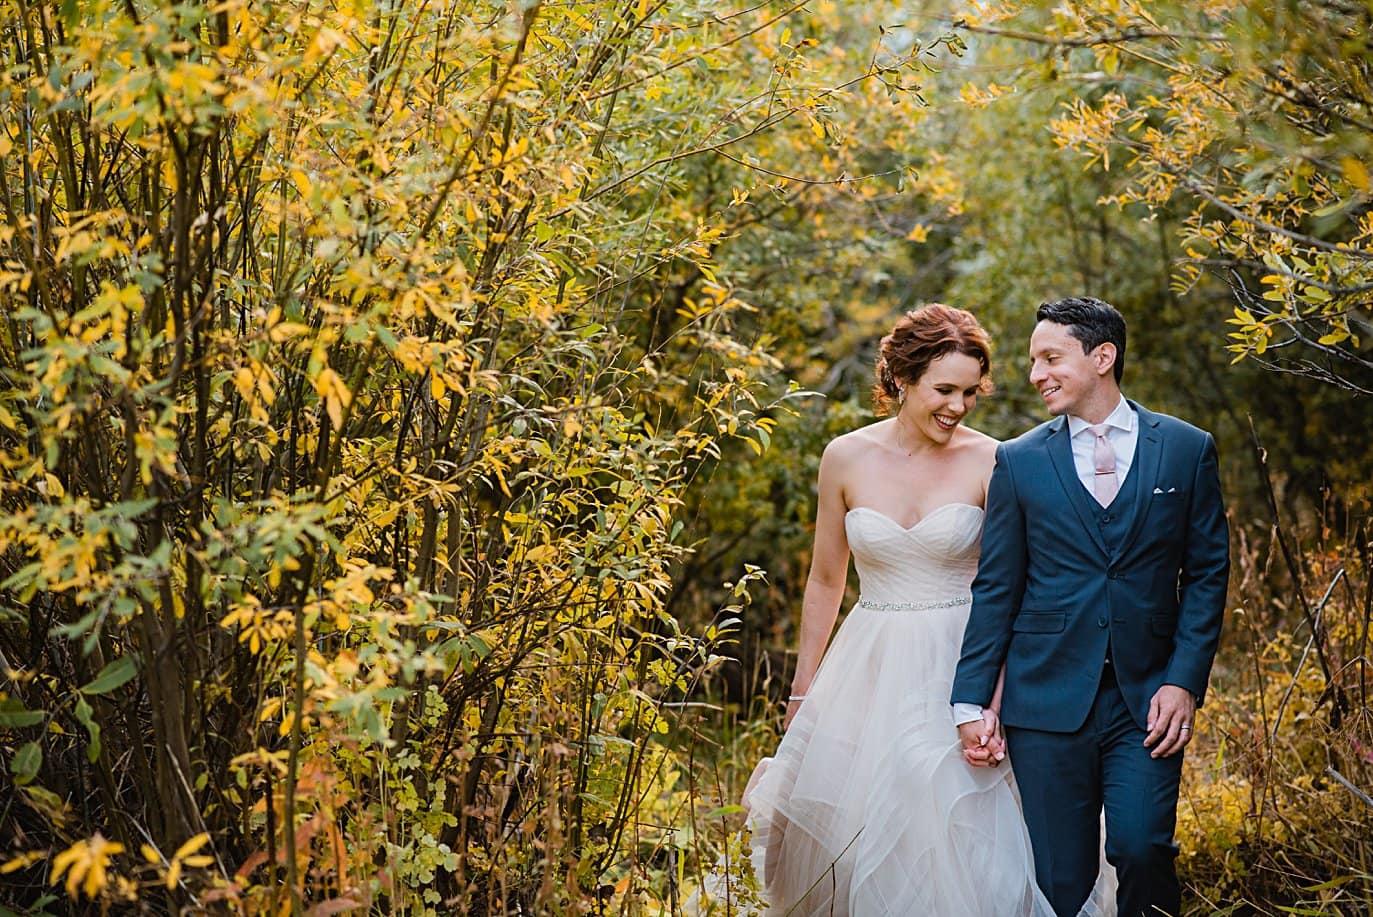 fall wedding portrait in Aspen by Denver wedding photographer Jennie Crate